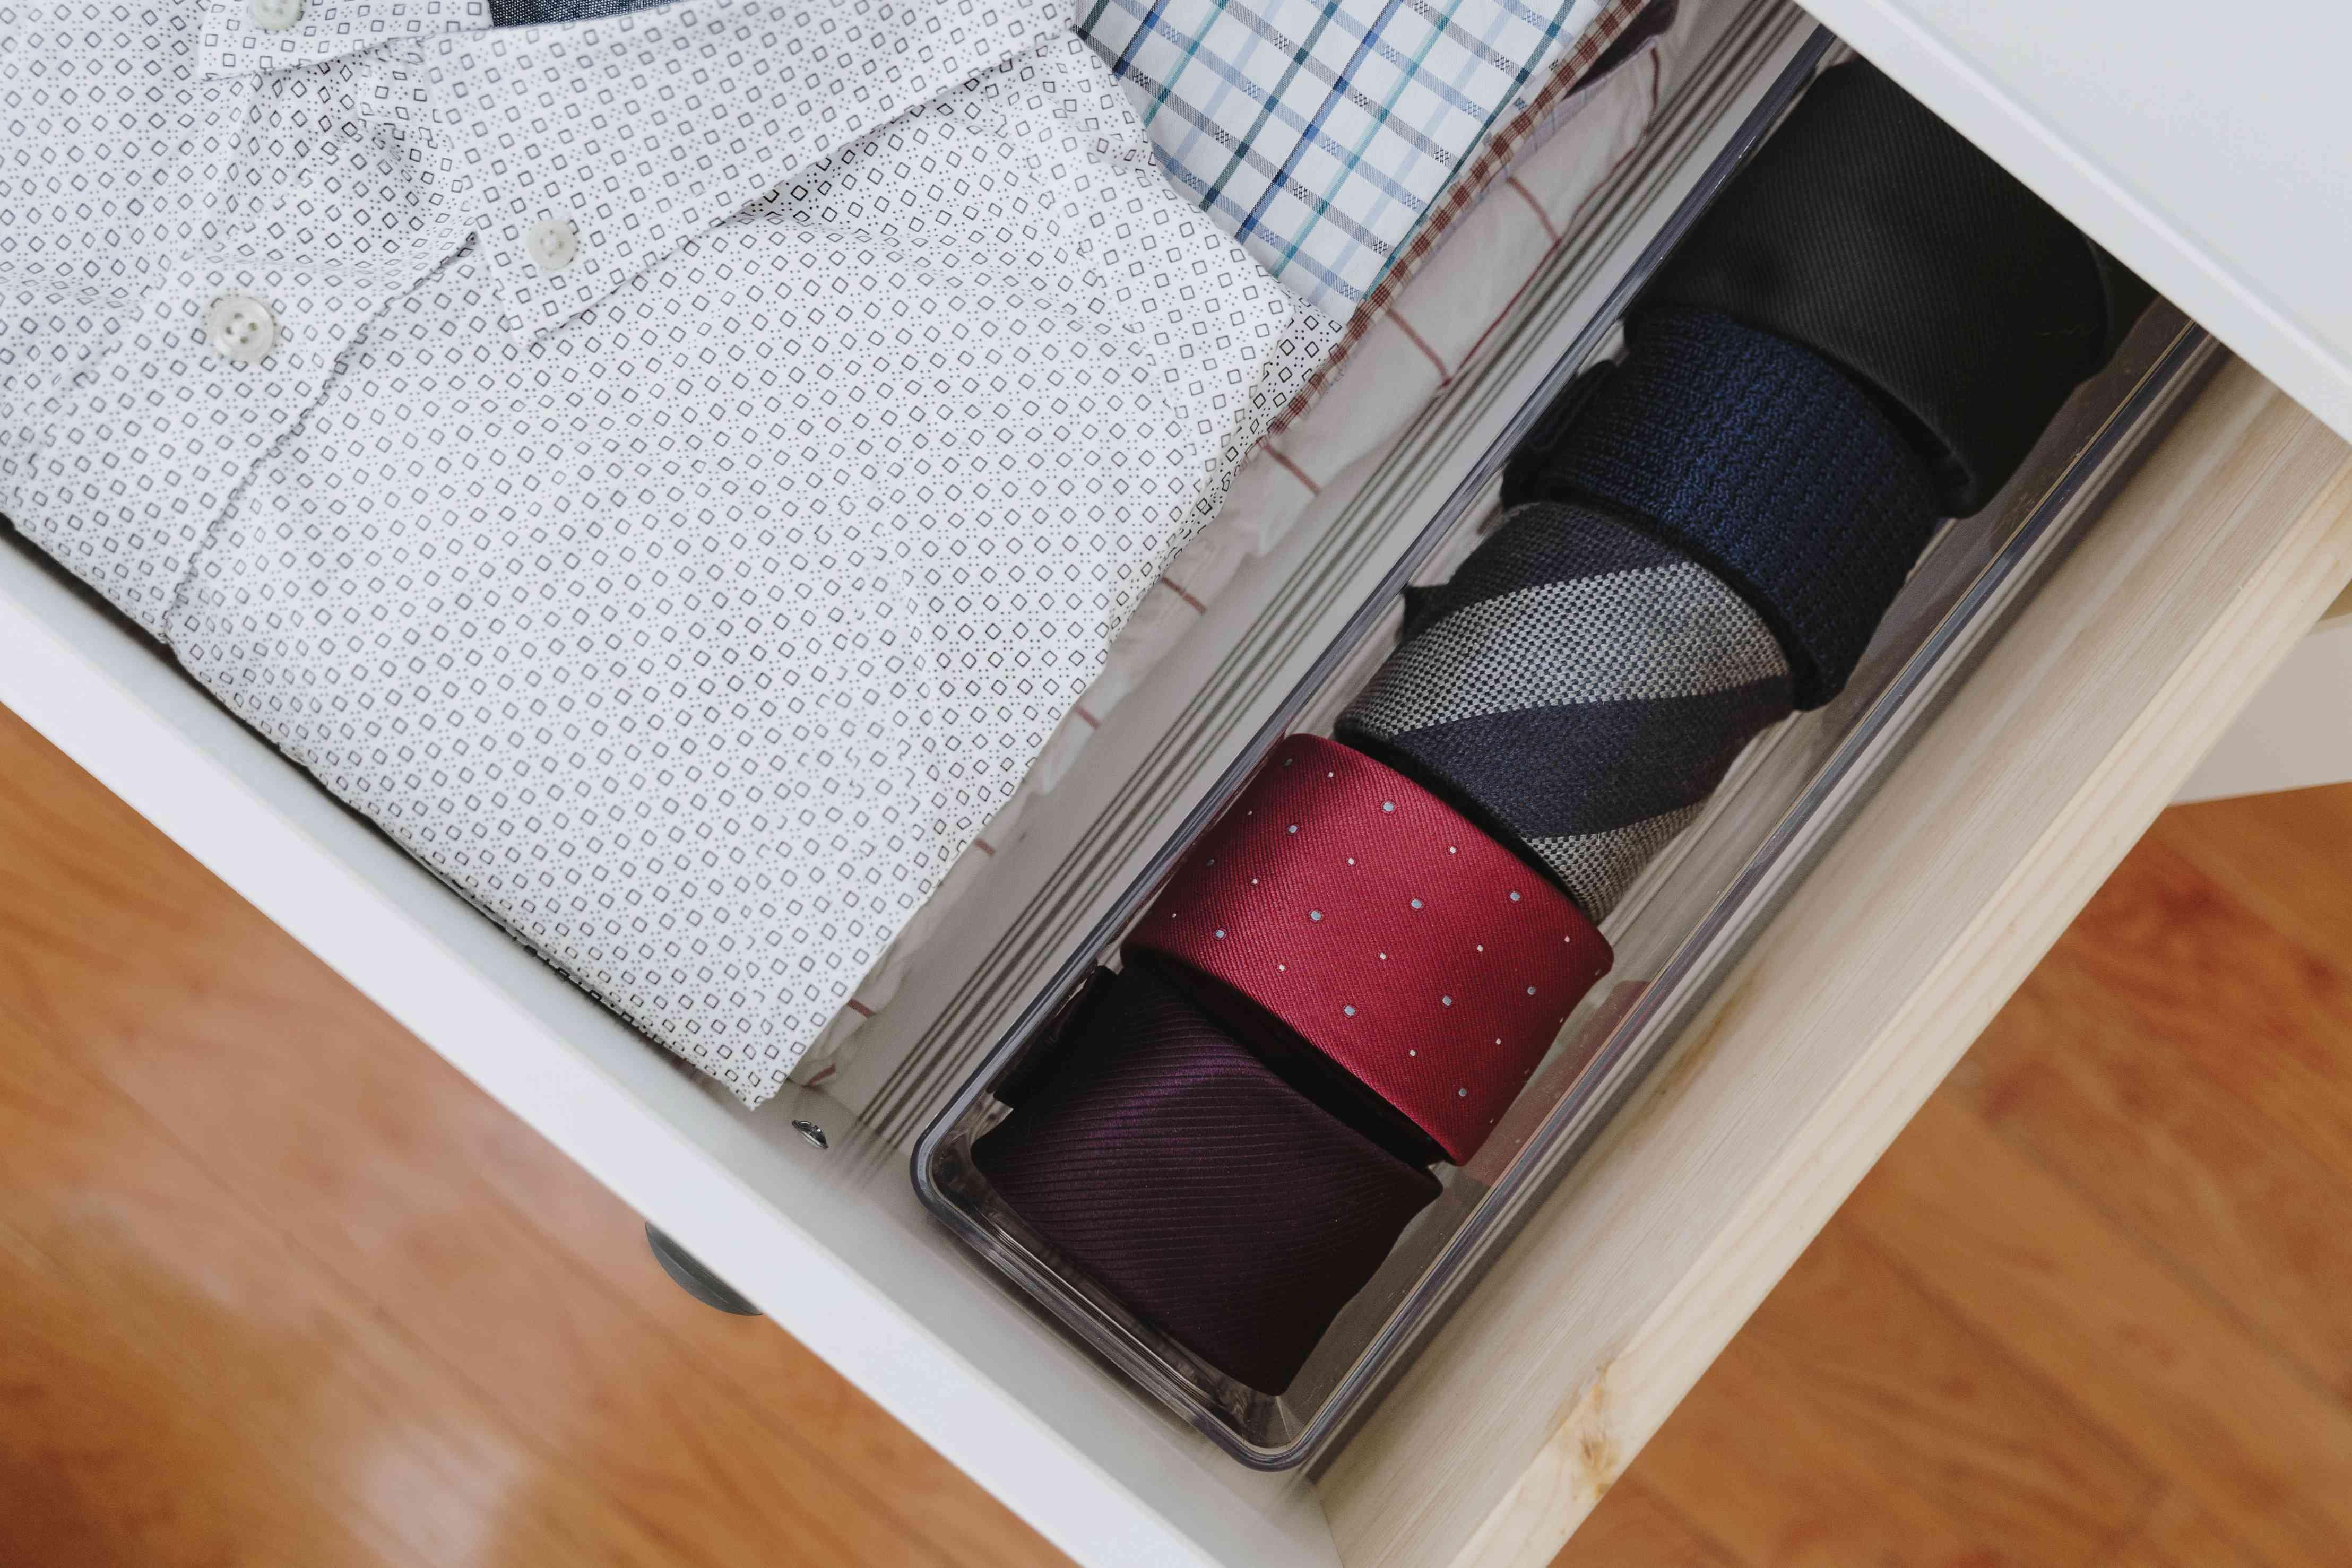 plastic organizer used to hold ties